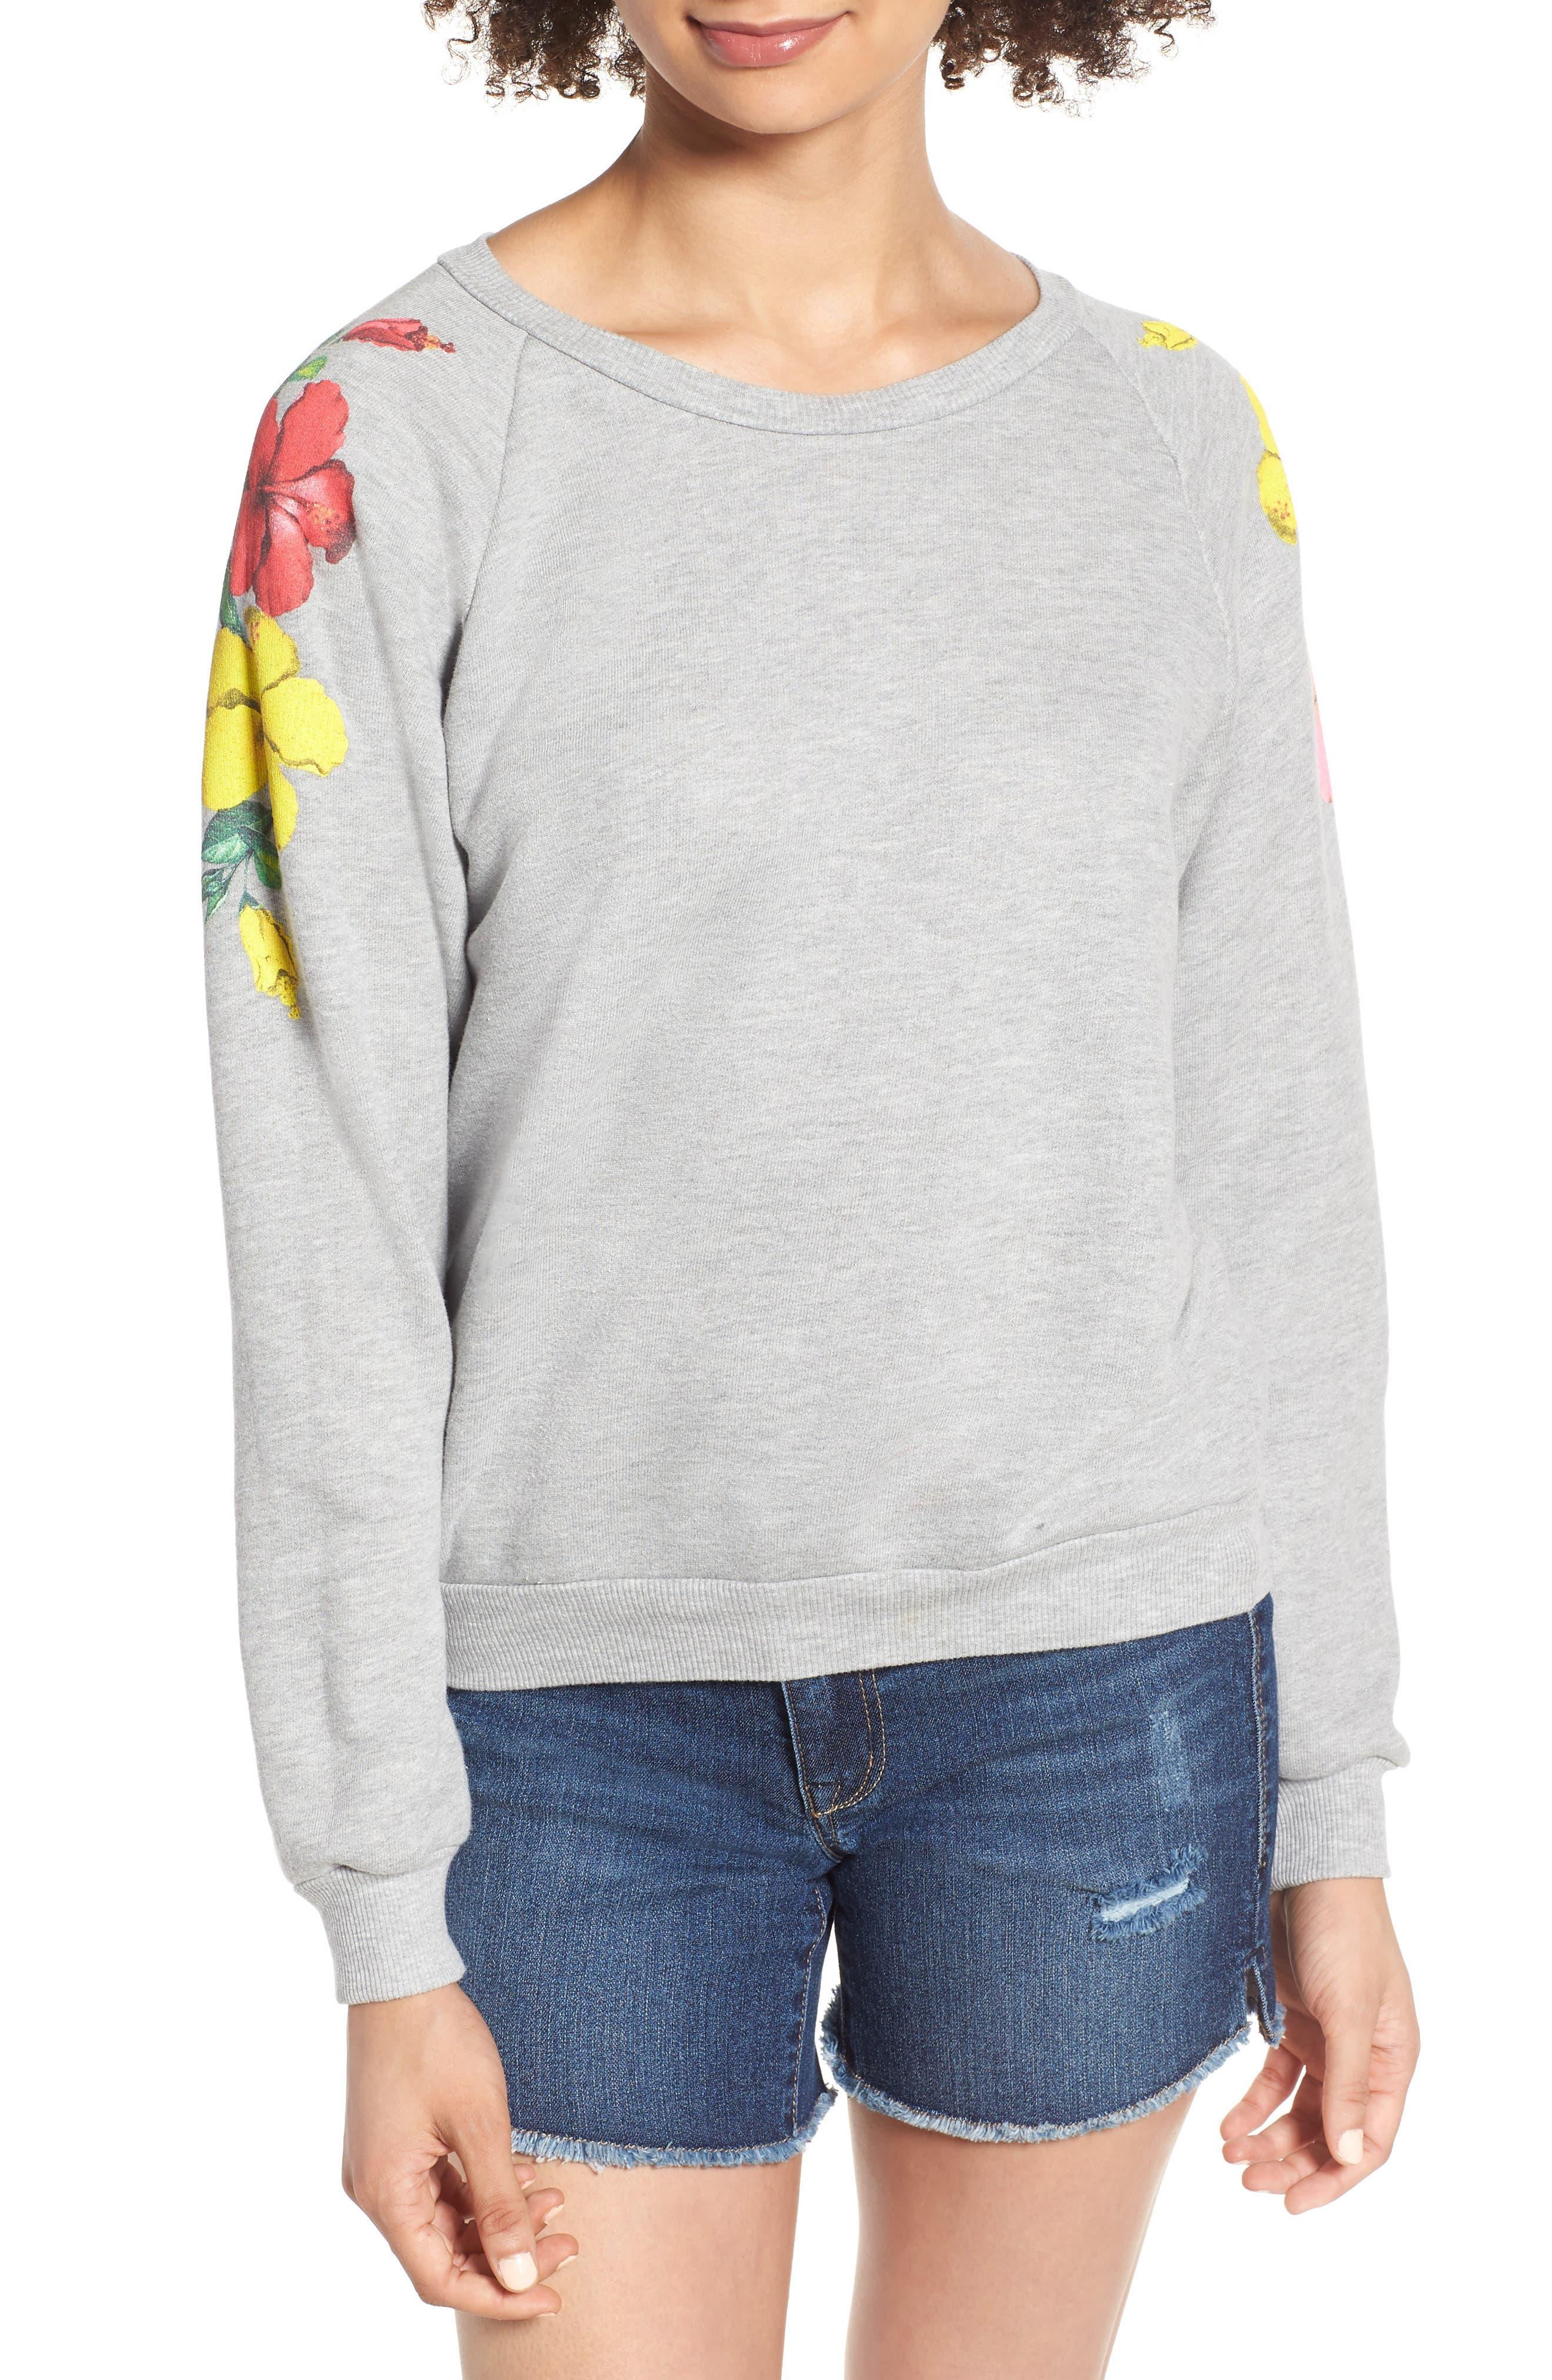 Hibiscus Junior Sweatshirt,                         Main,                         color, 020